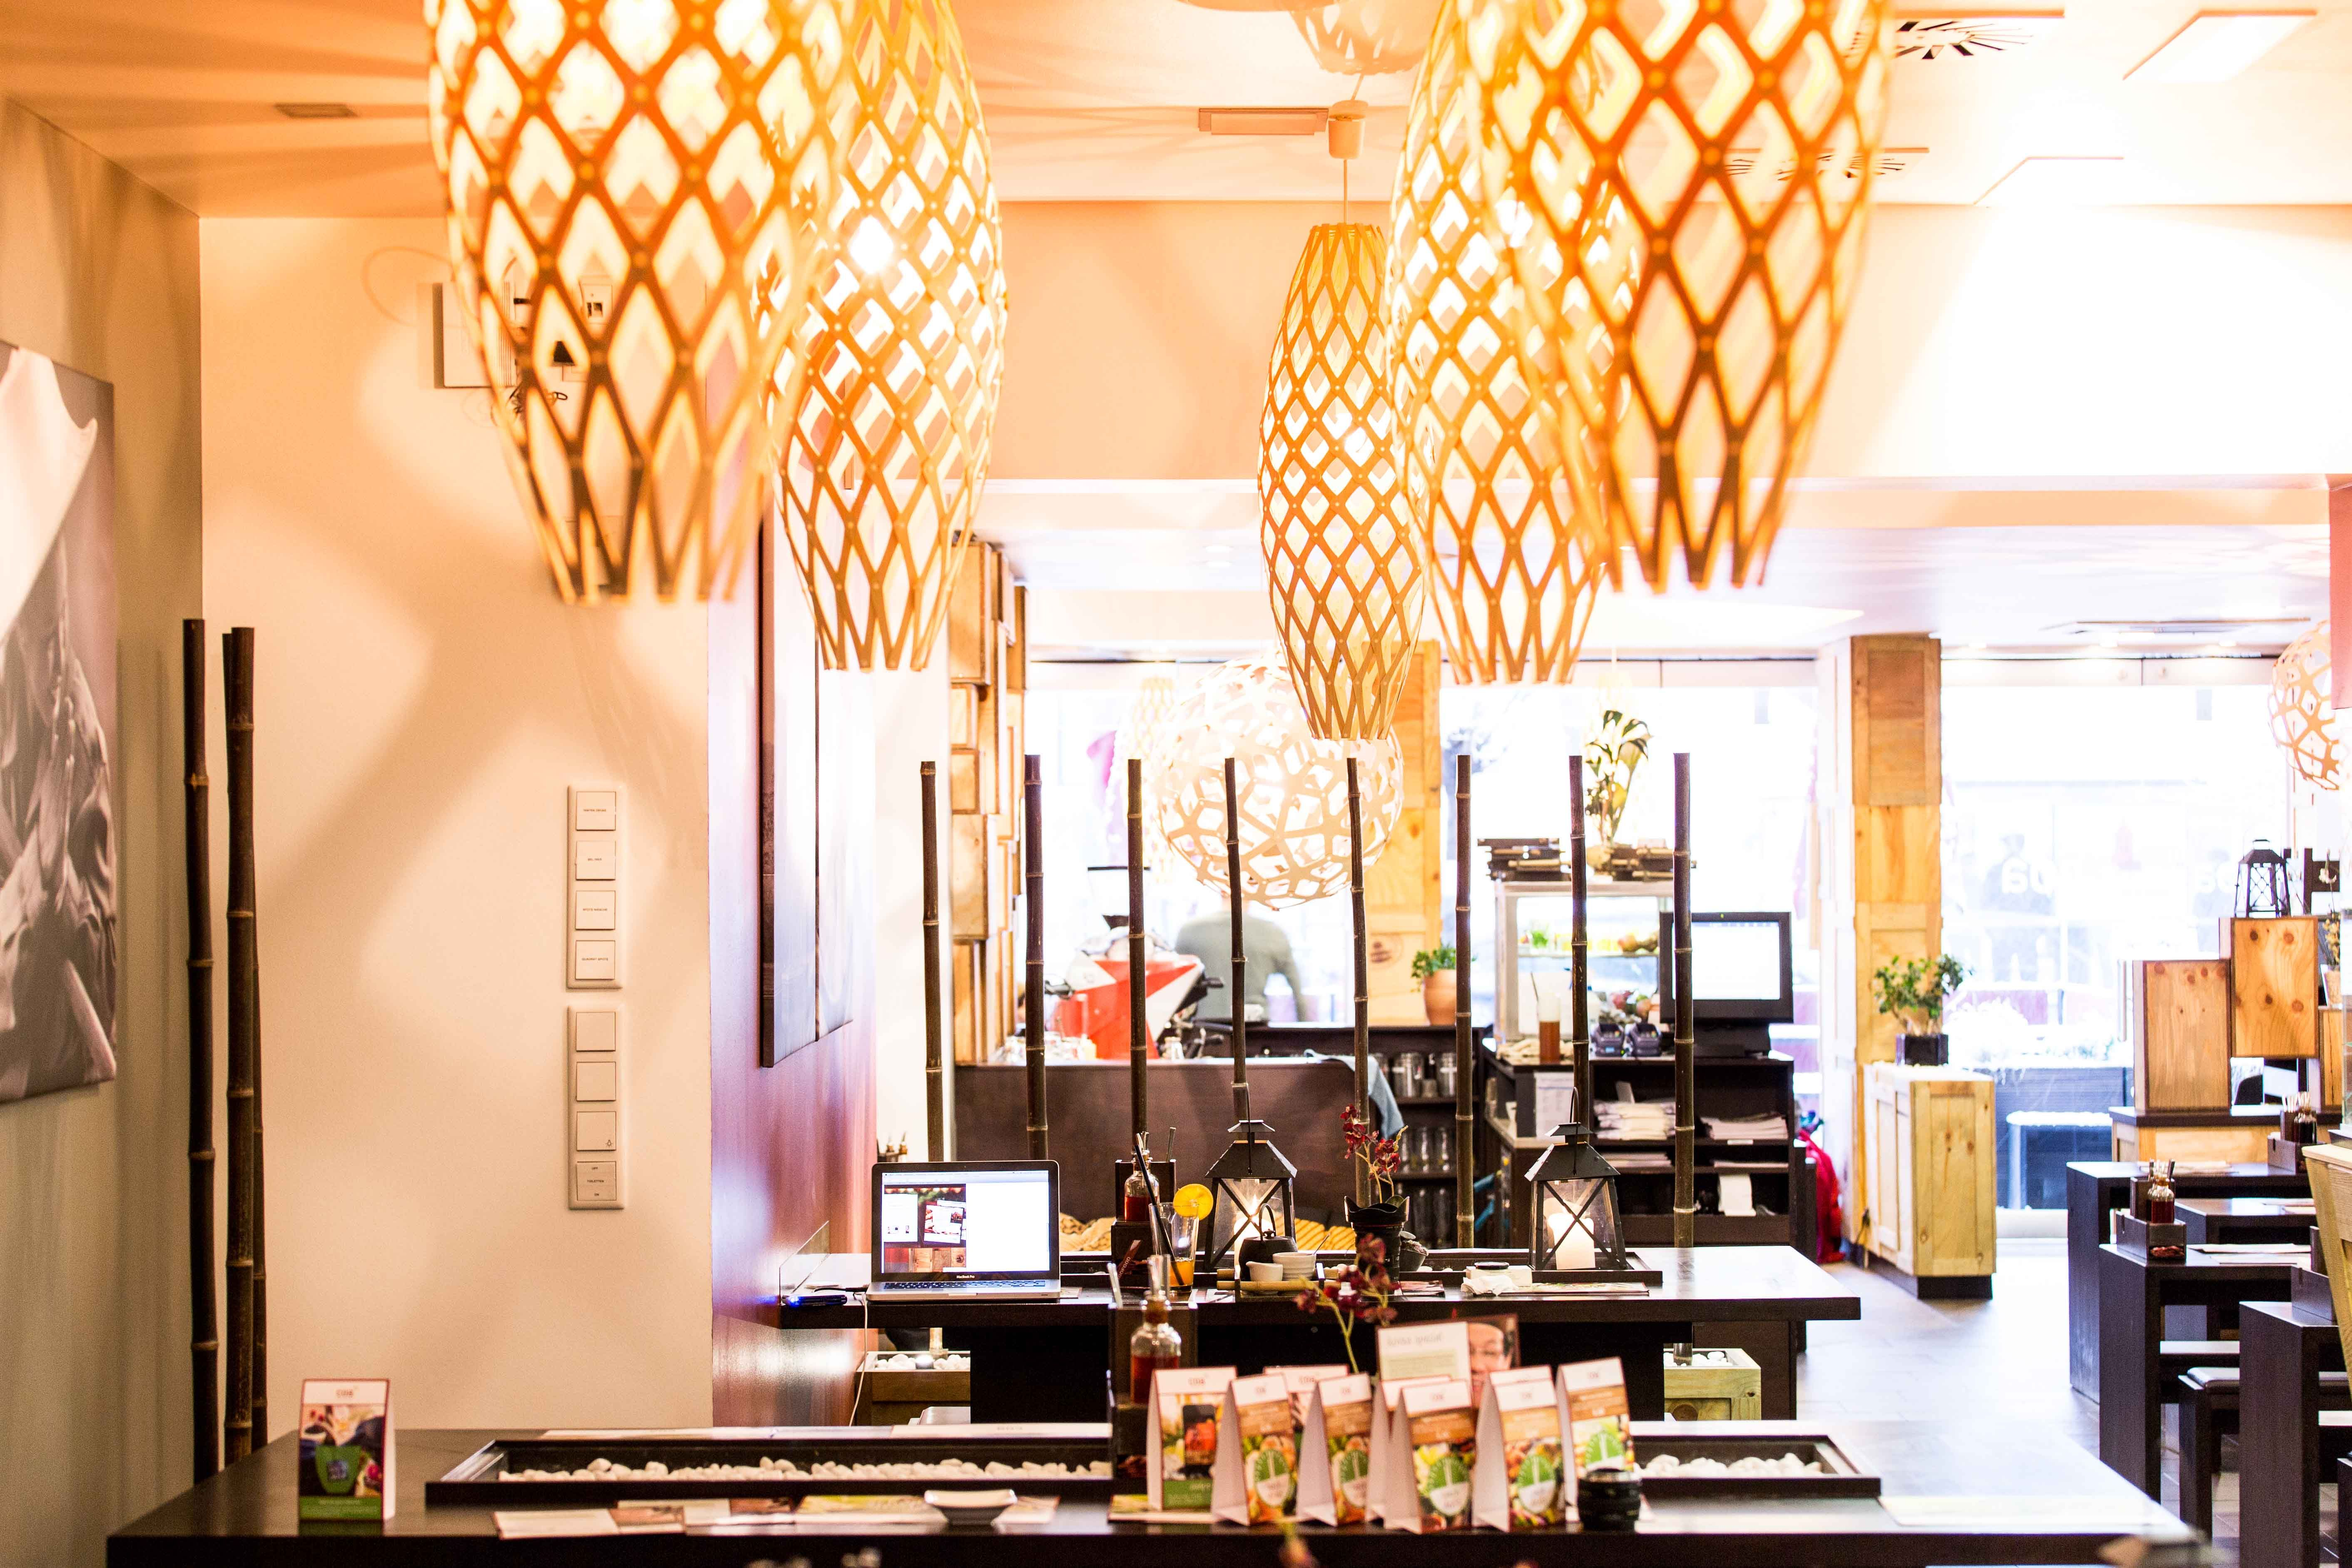 Coa Asian Food & Bar Coa Interior Design Asian Inspired